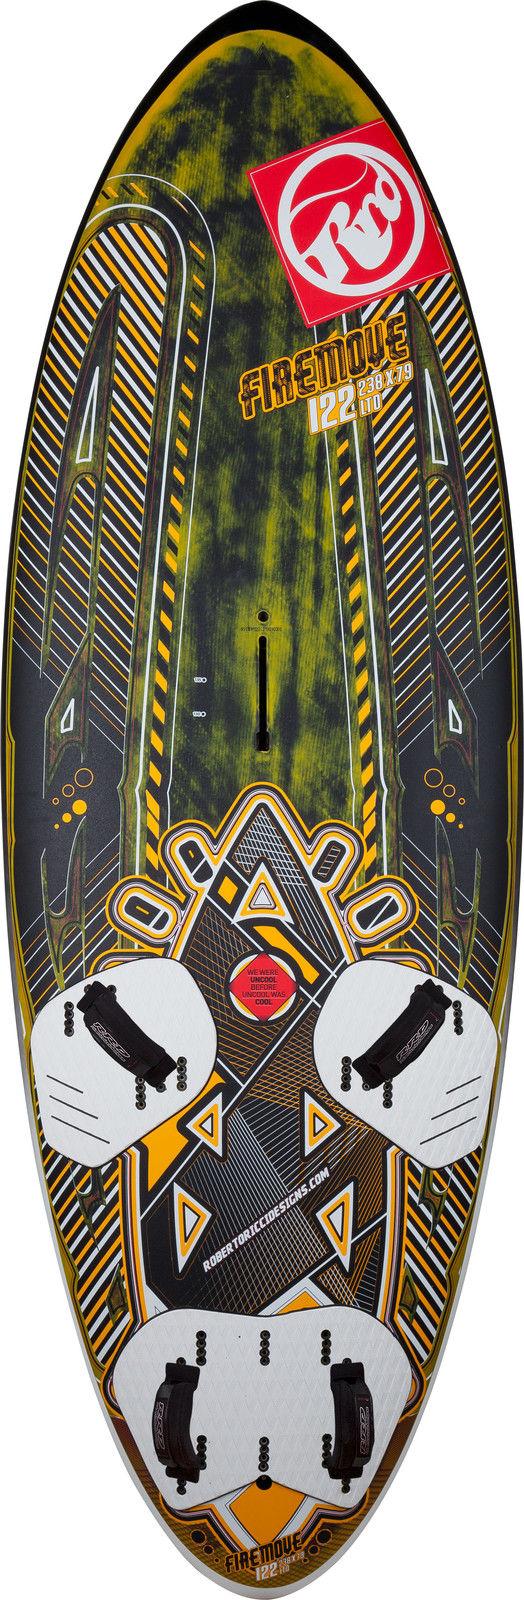 Firemove V2 LTD Windsurfboard RRD 2016